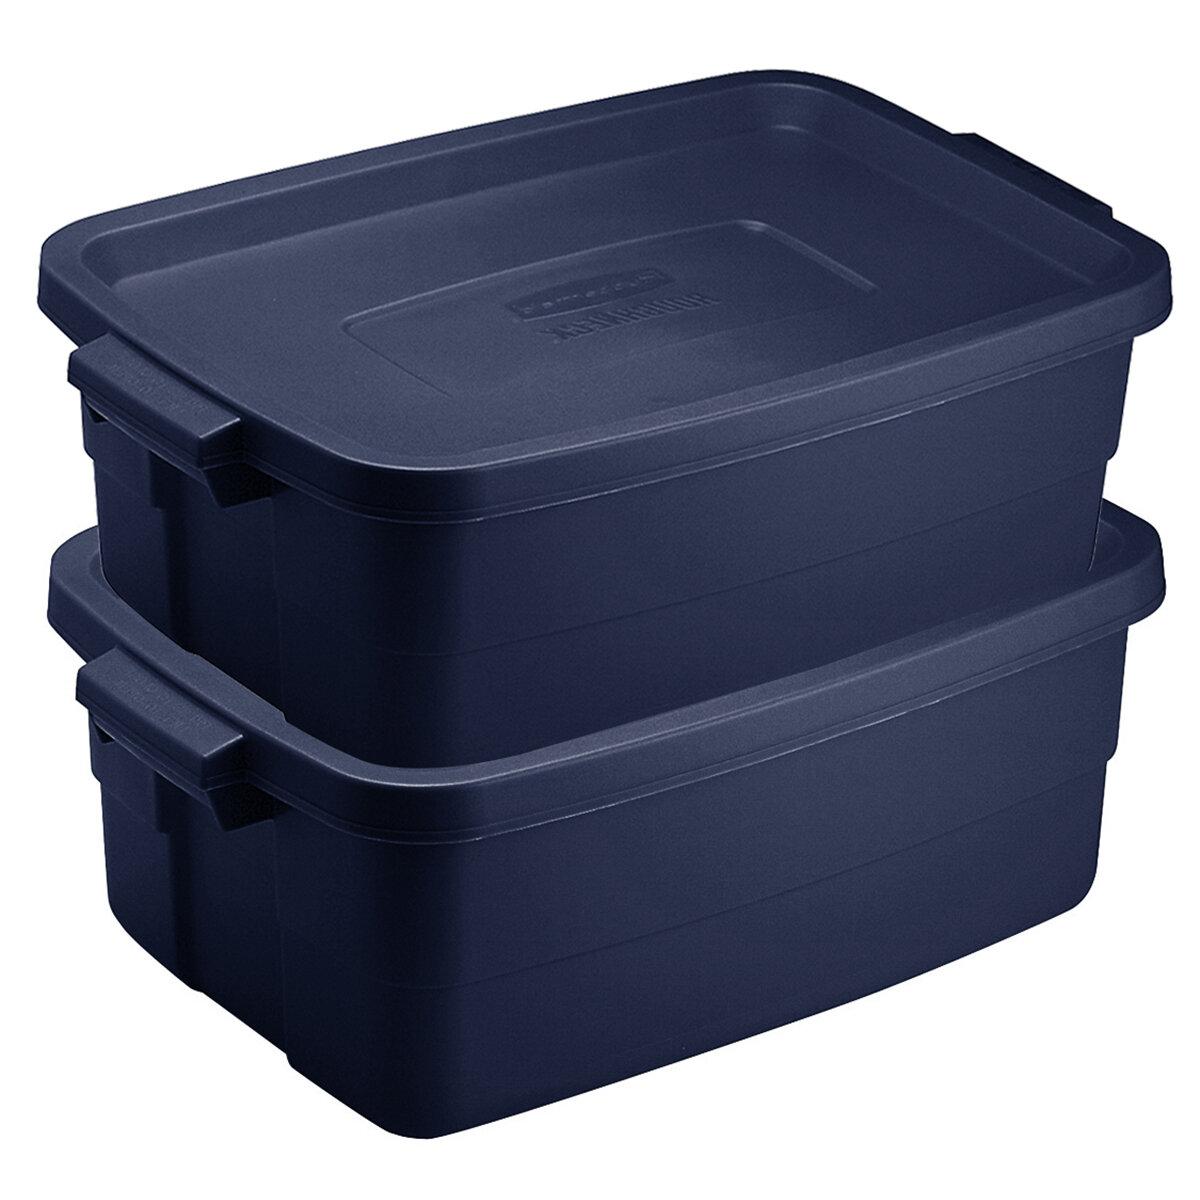 3 Gallon Dark Indigo Metallic RUBBERMAID Storage Tote-Pack of 6